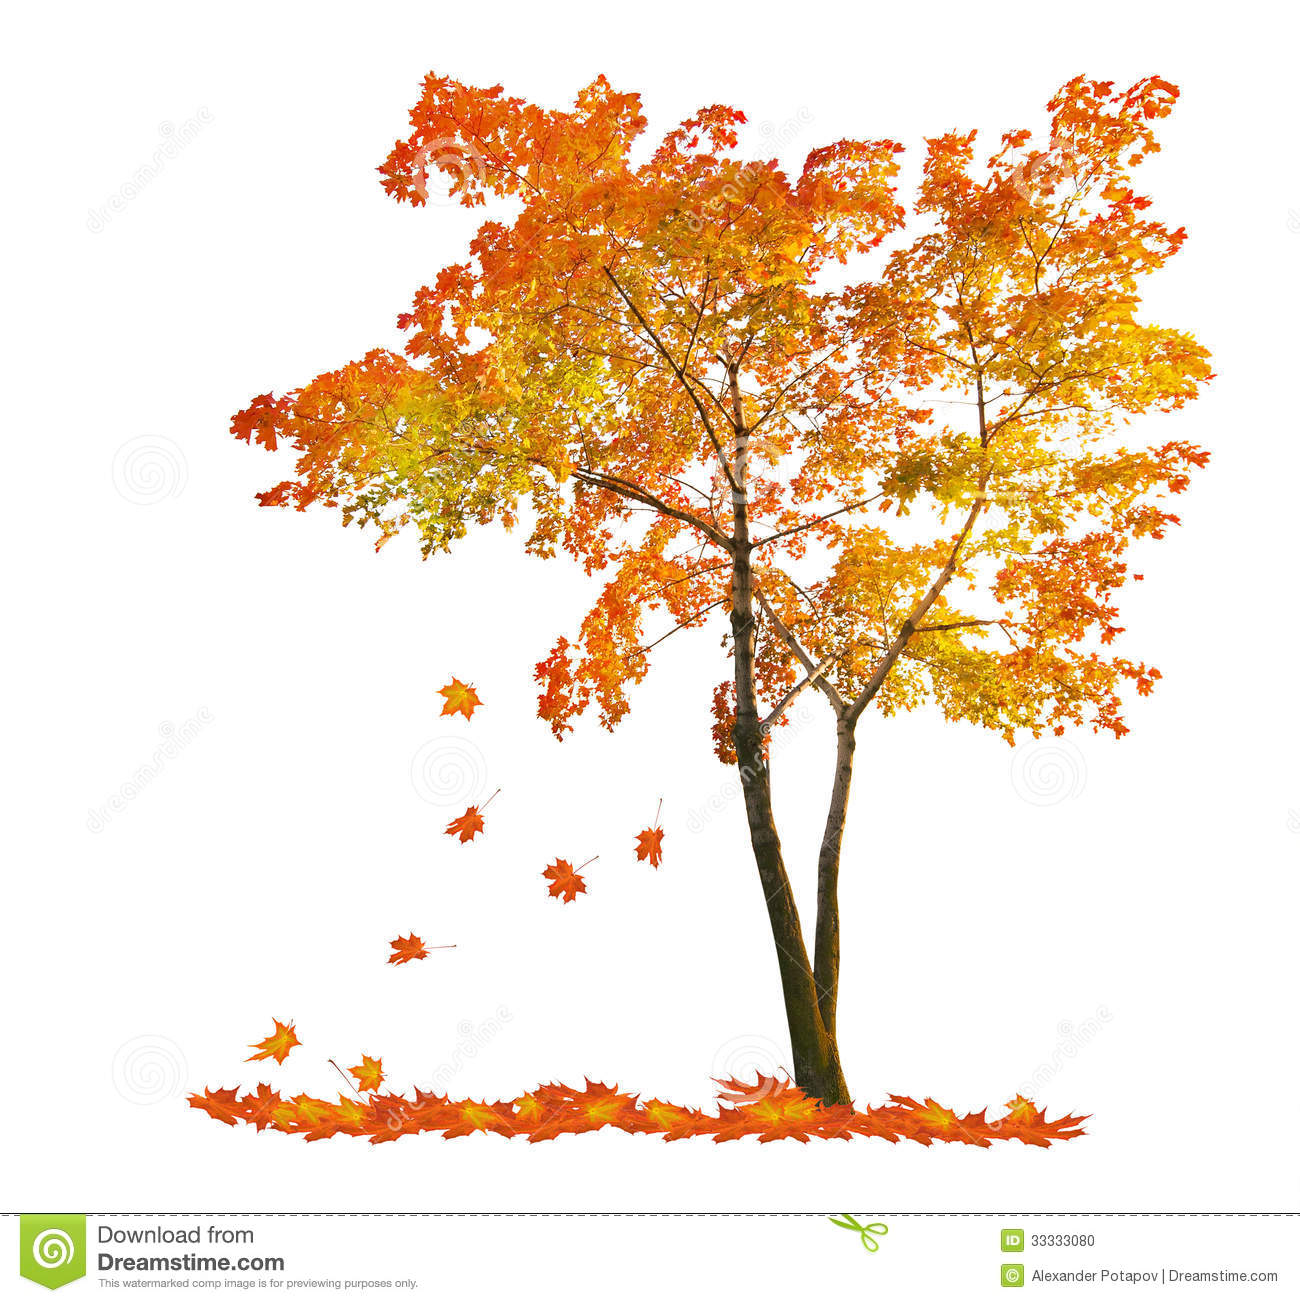 Tree clipart autumn leaves #3